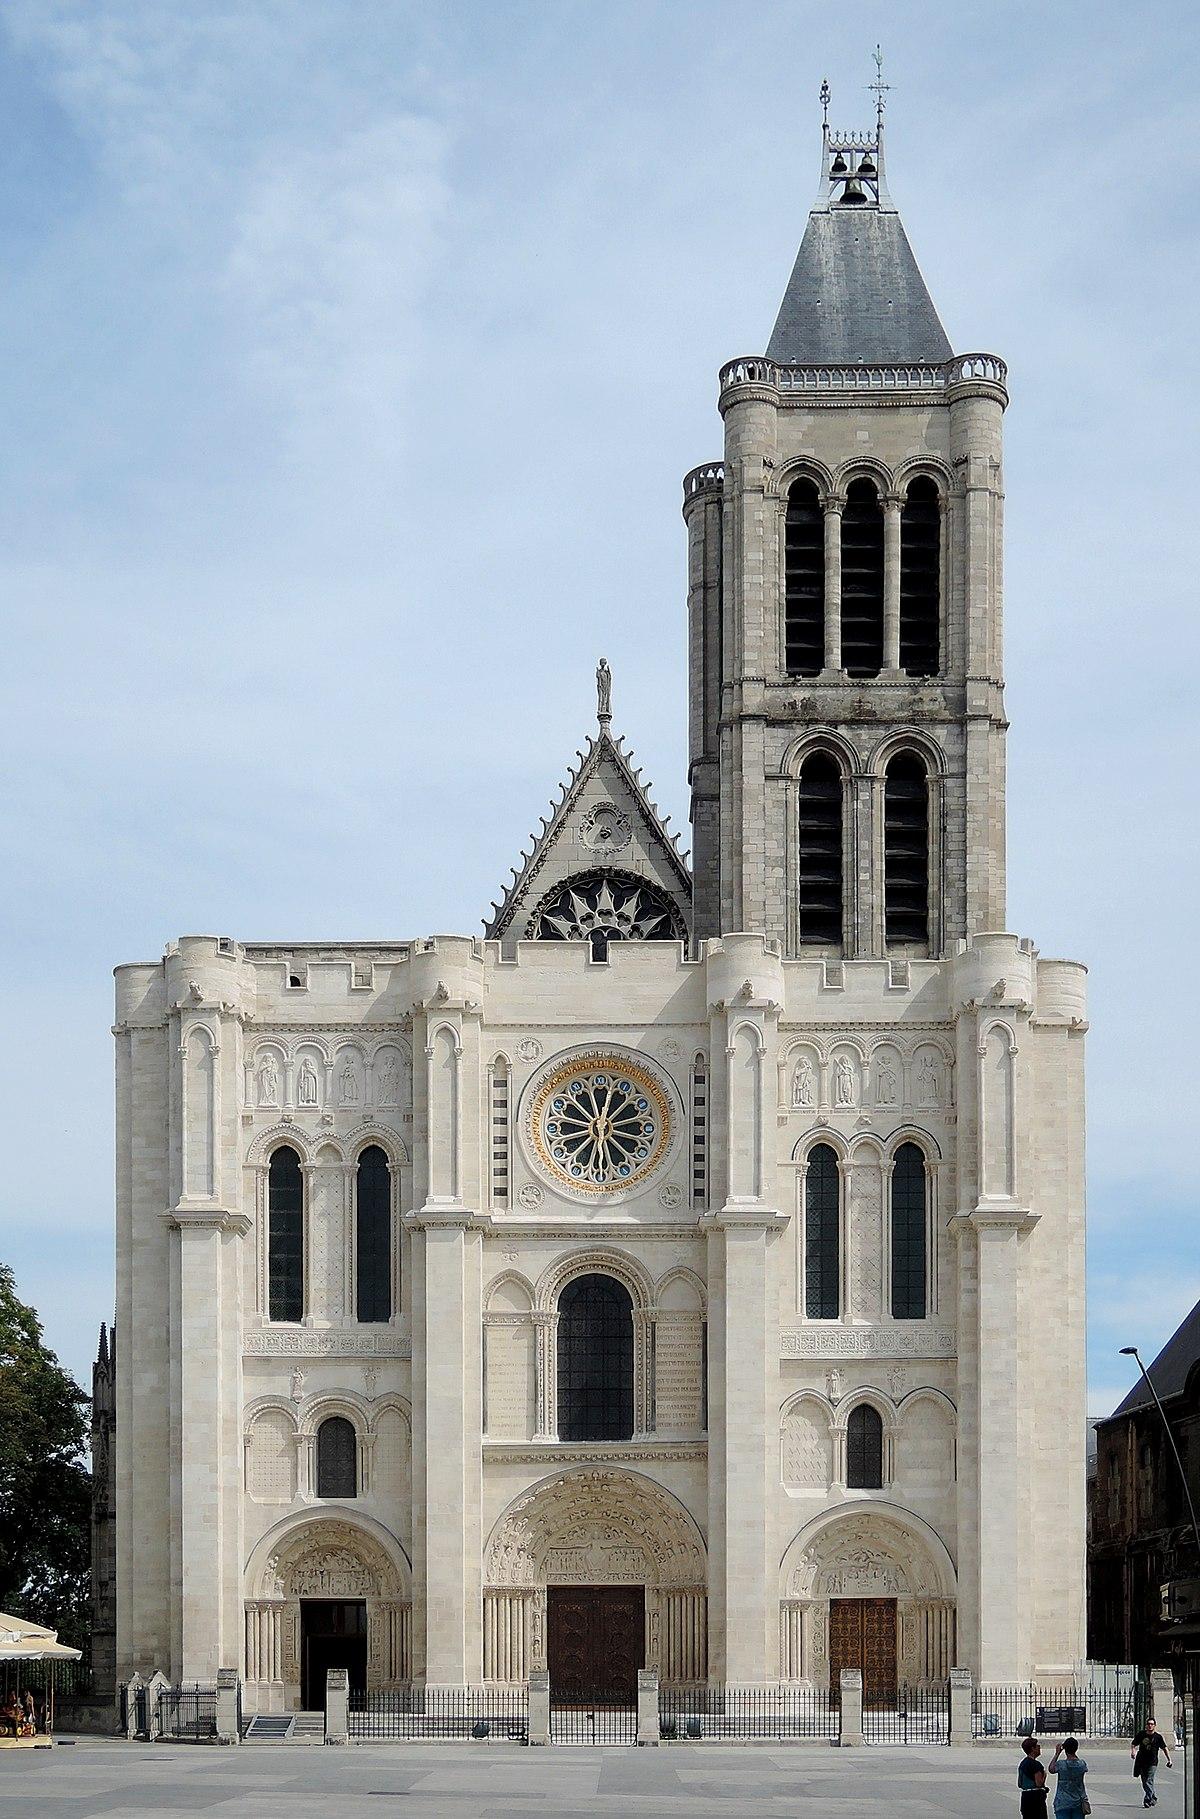 Façade de la basilique de Saint-Denis